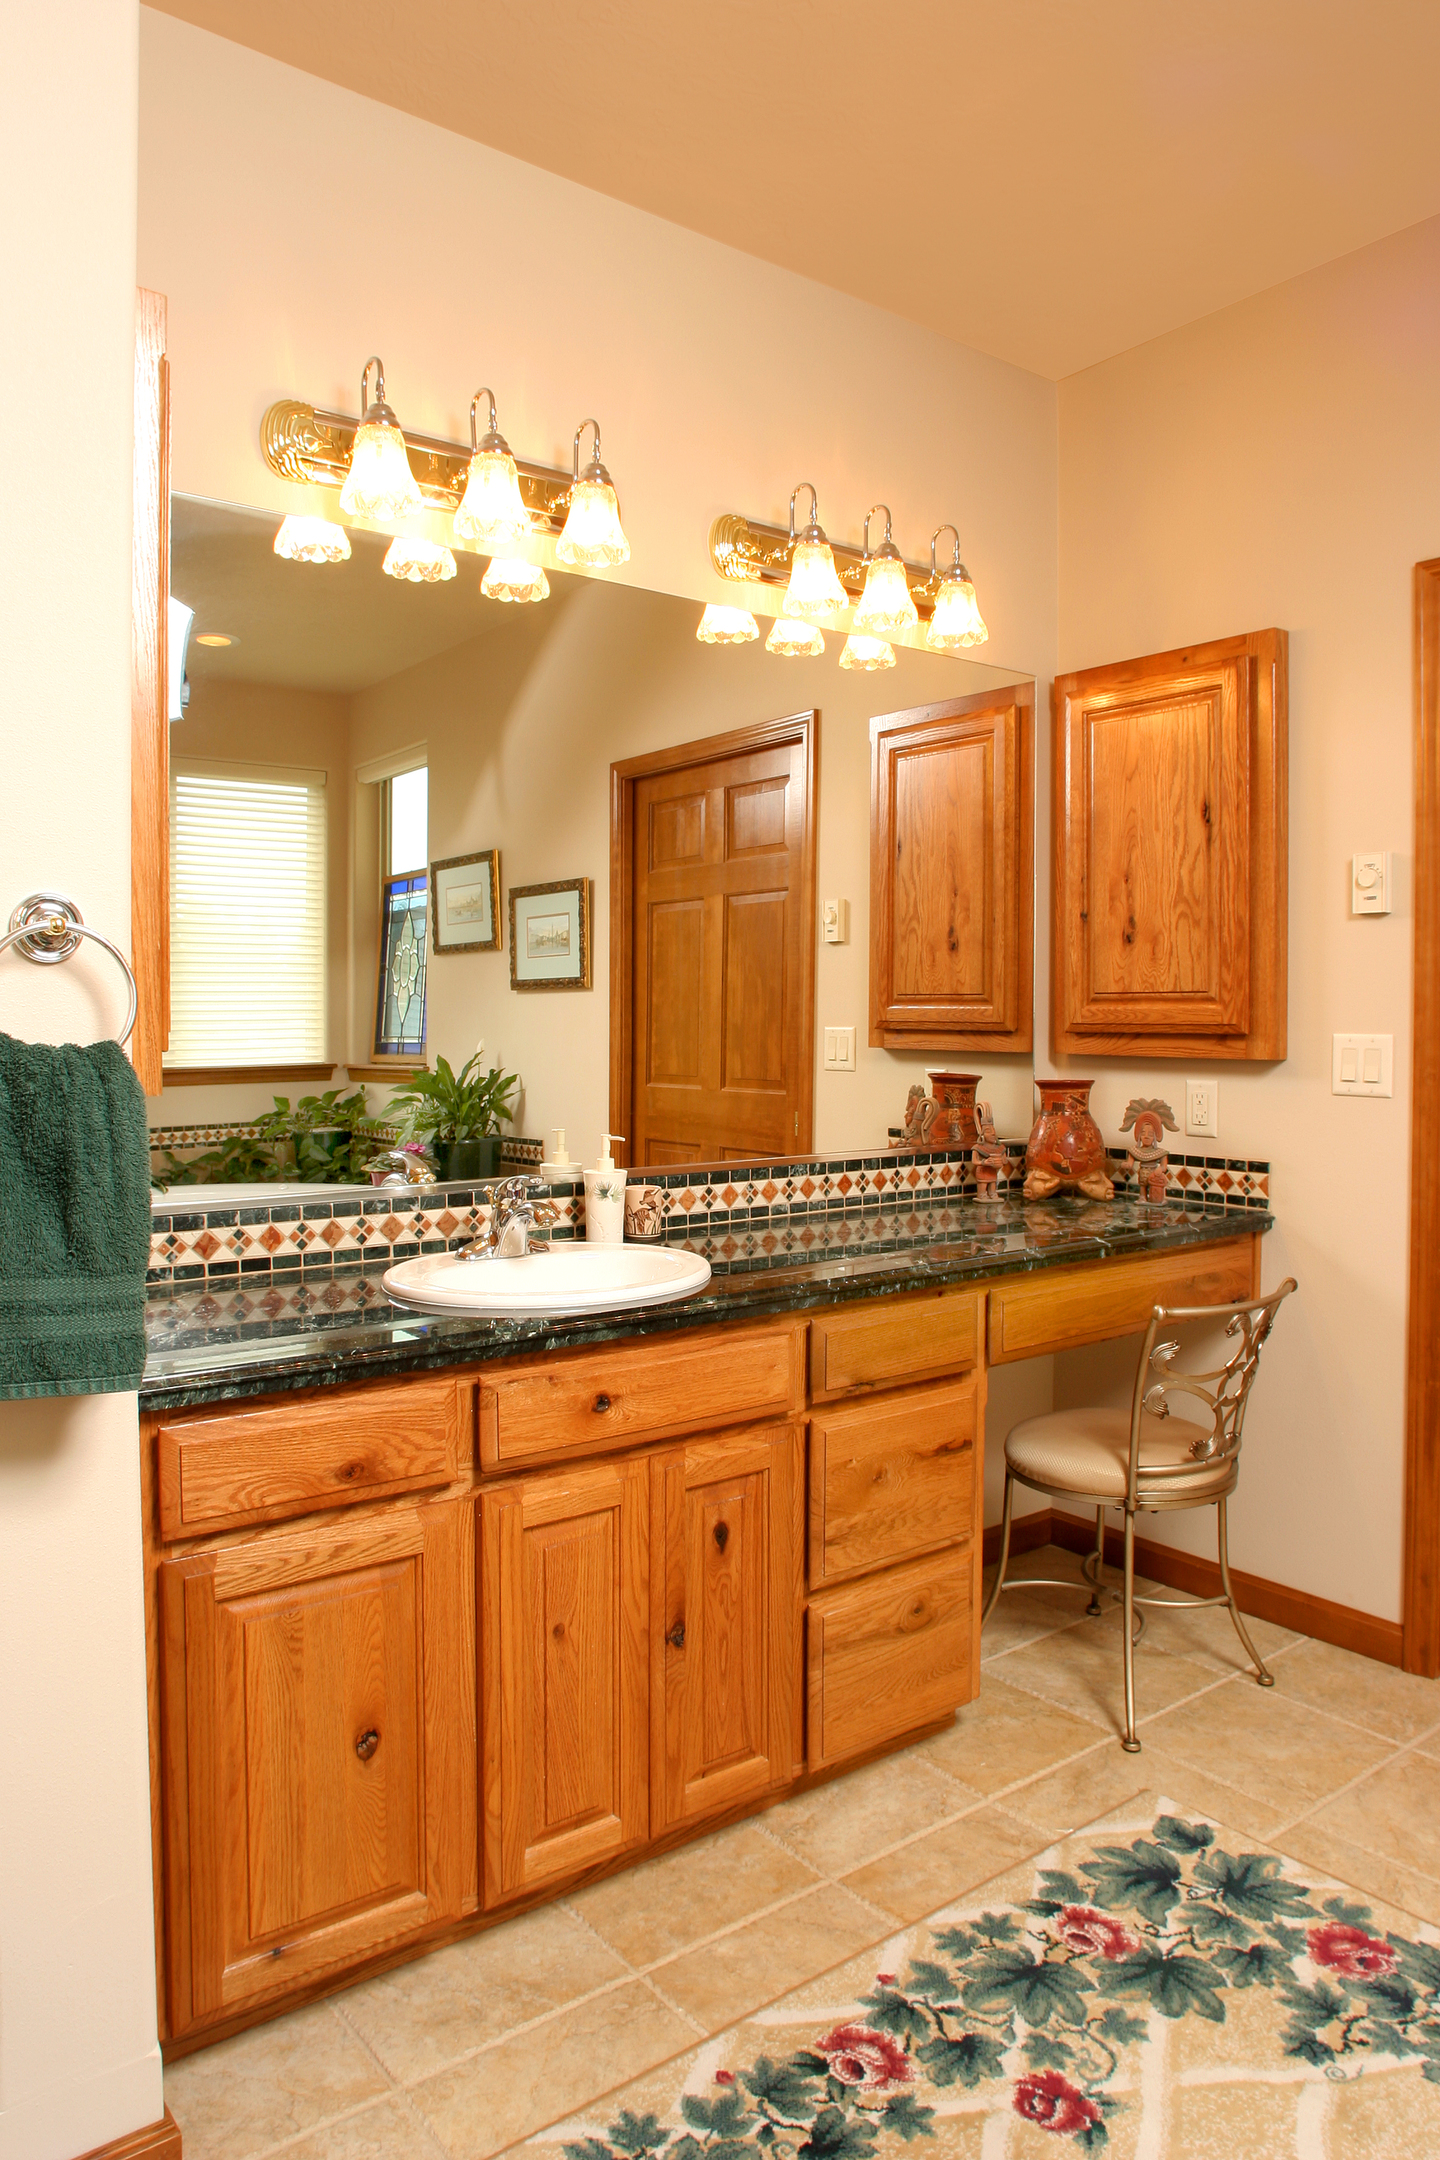 Hickory Kitchen Cabinet Hardware Affordable Custom Cabinets Showroom